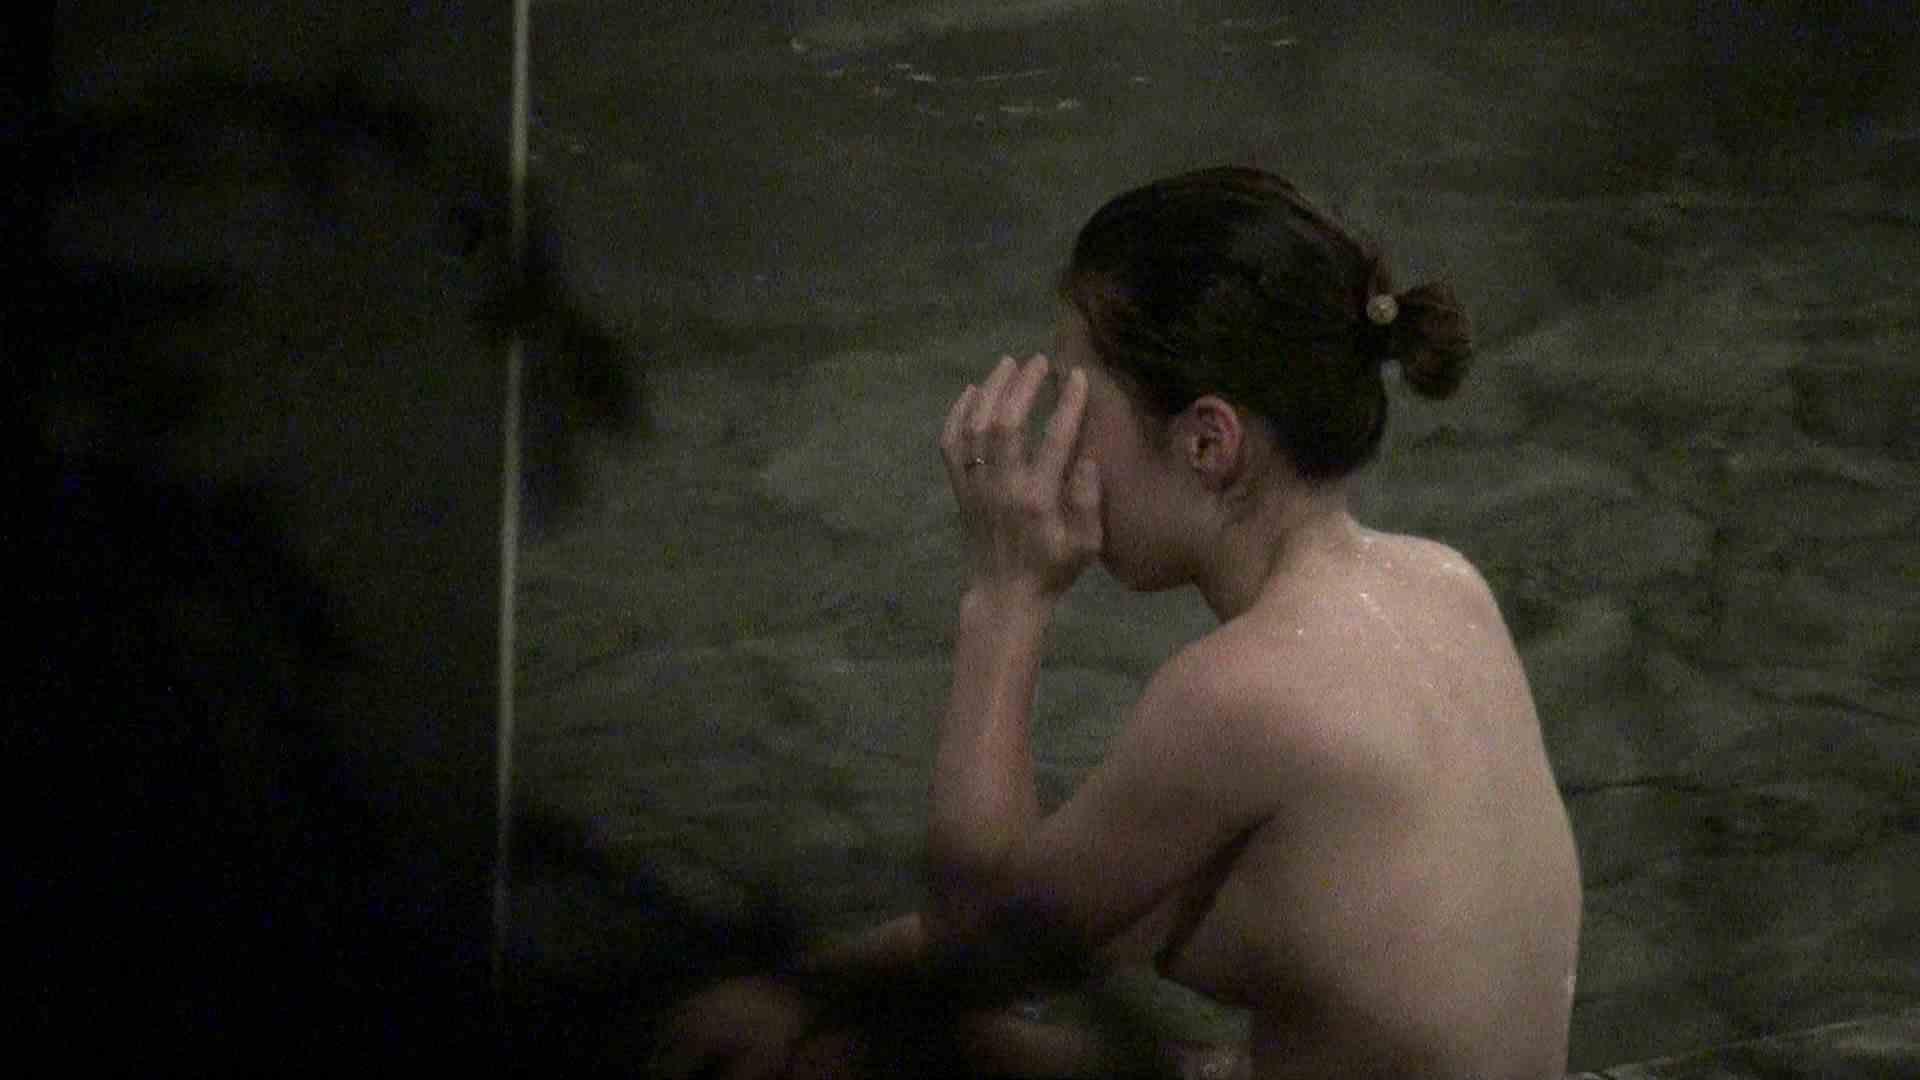 Aquaな露天風呂Vol.391 美しいOLの裸体 えろ無修正画像 99pic 35